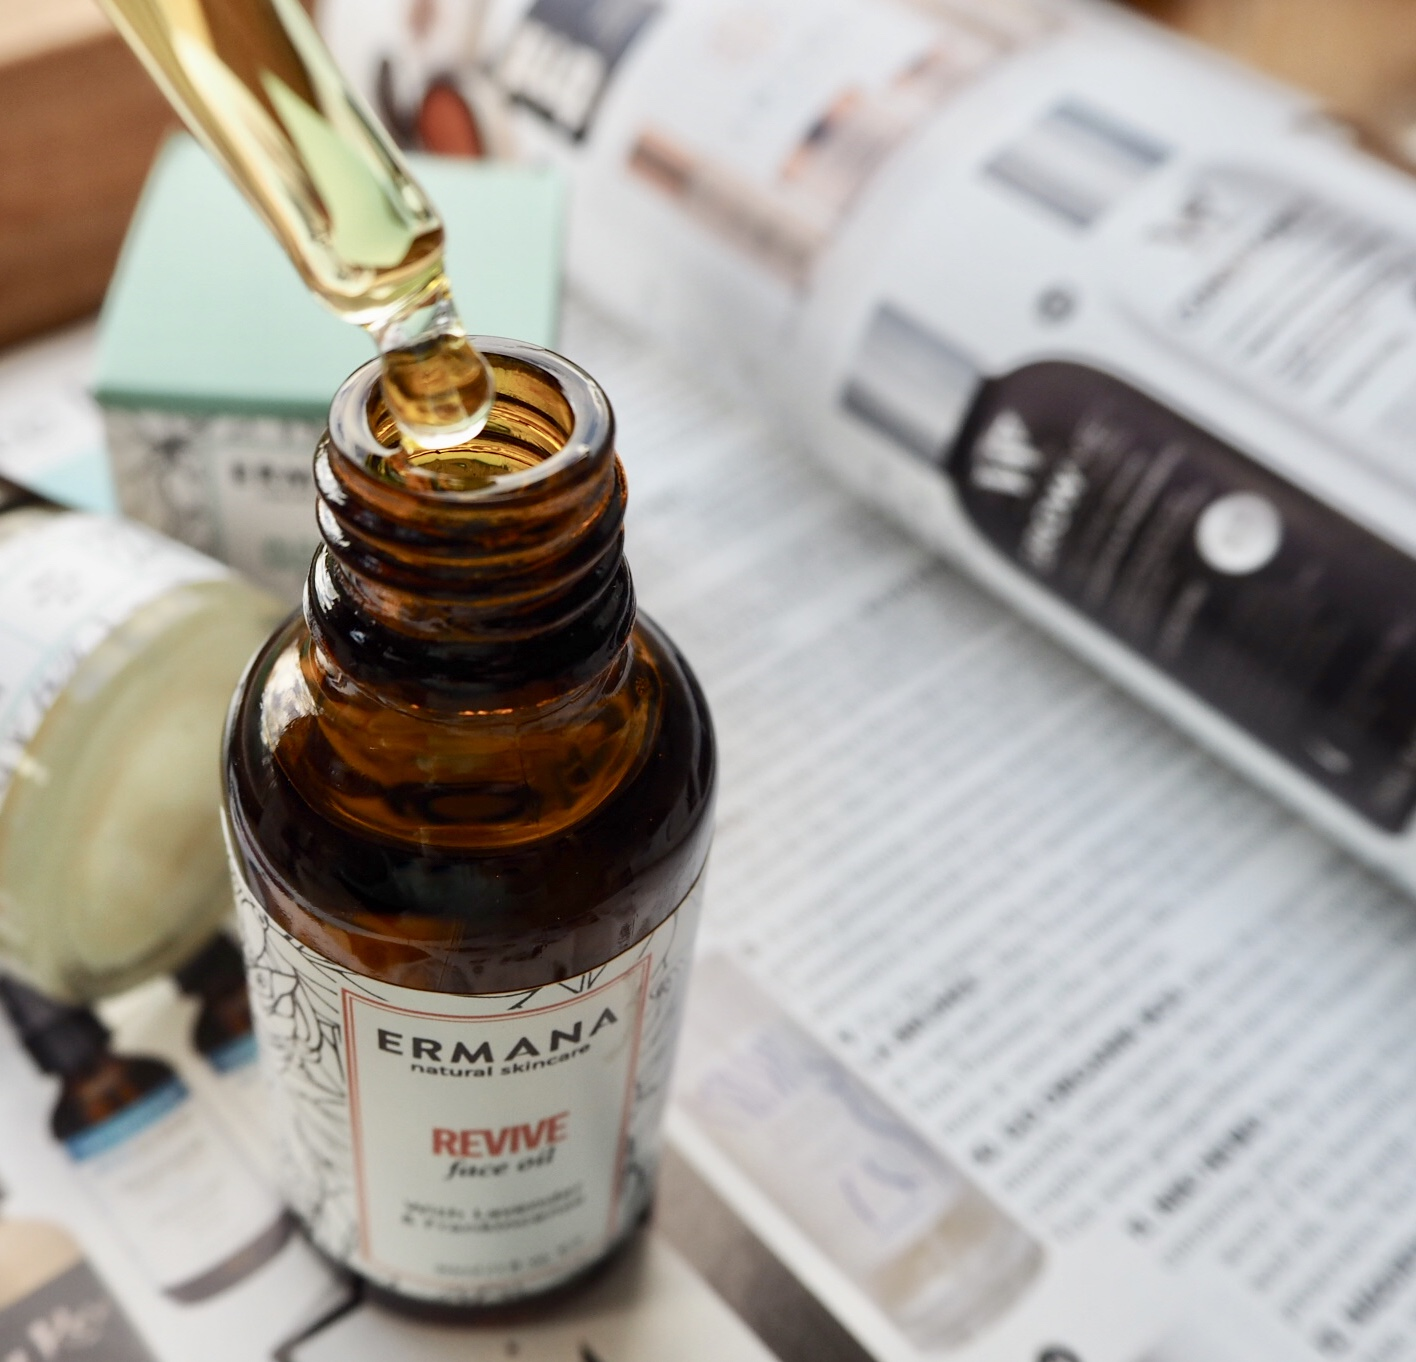 Ethical beauty. Ermana revive facial oil